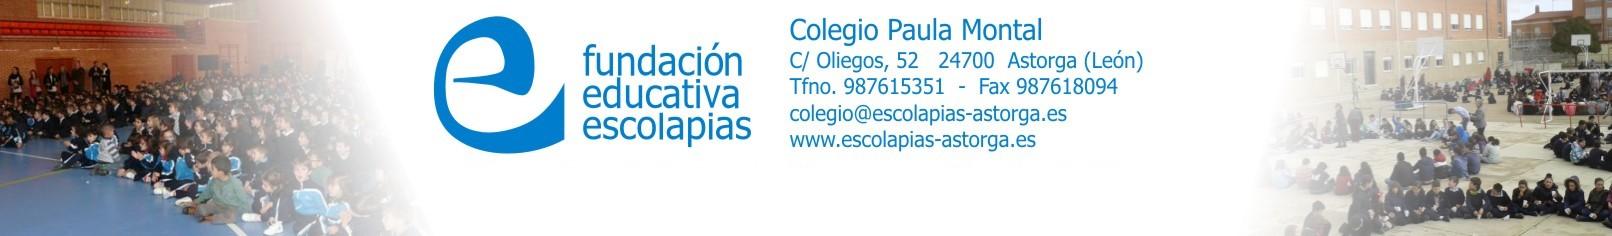 Colegio Paula Montal